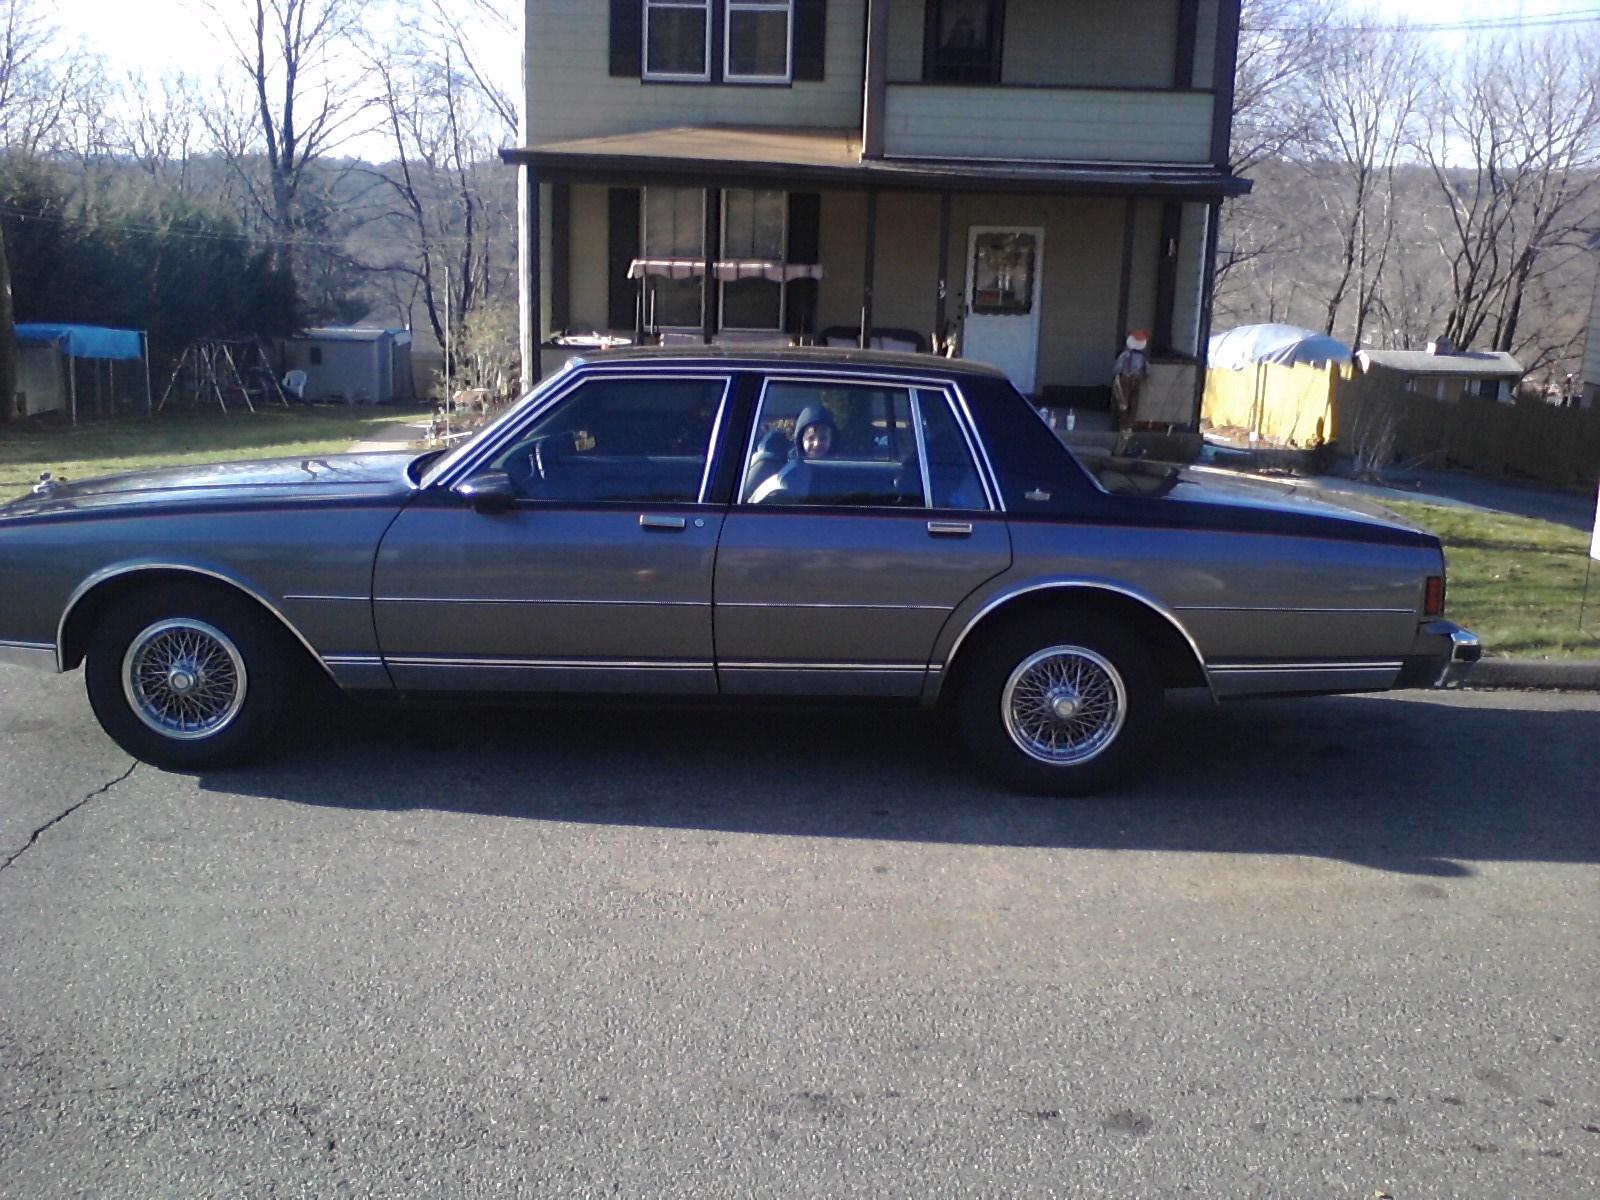 1988 Monte Carlo Ss Specs >> 1988 Chevrolet Caprice - Pictures - CarGurus